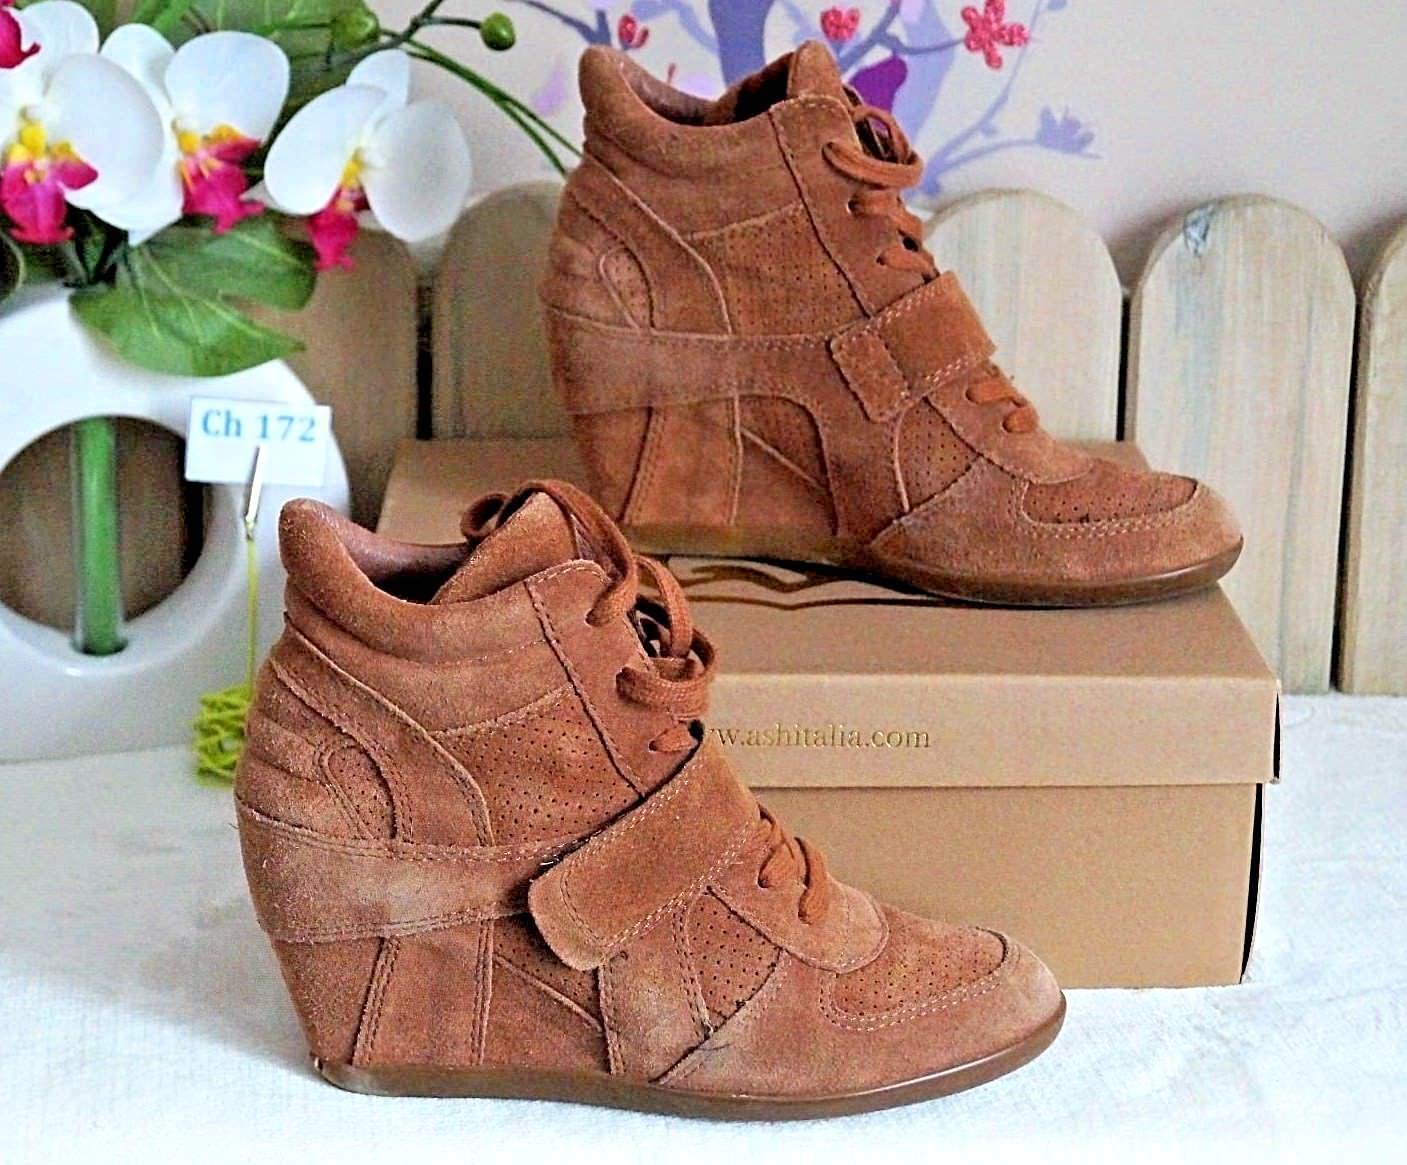 Chaussures Escarpins Occasion Daim Camel   Asn   ... P   38